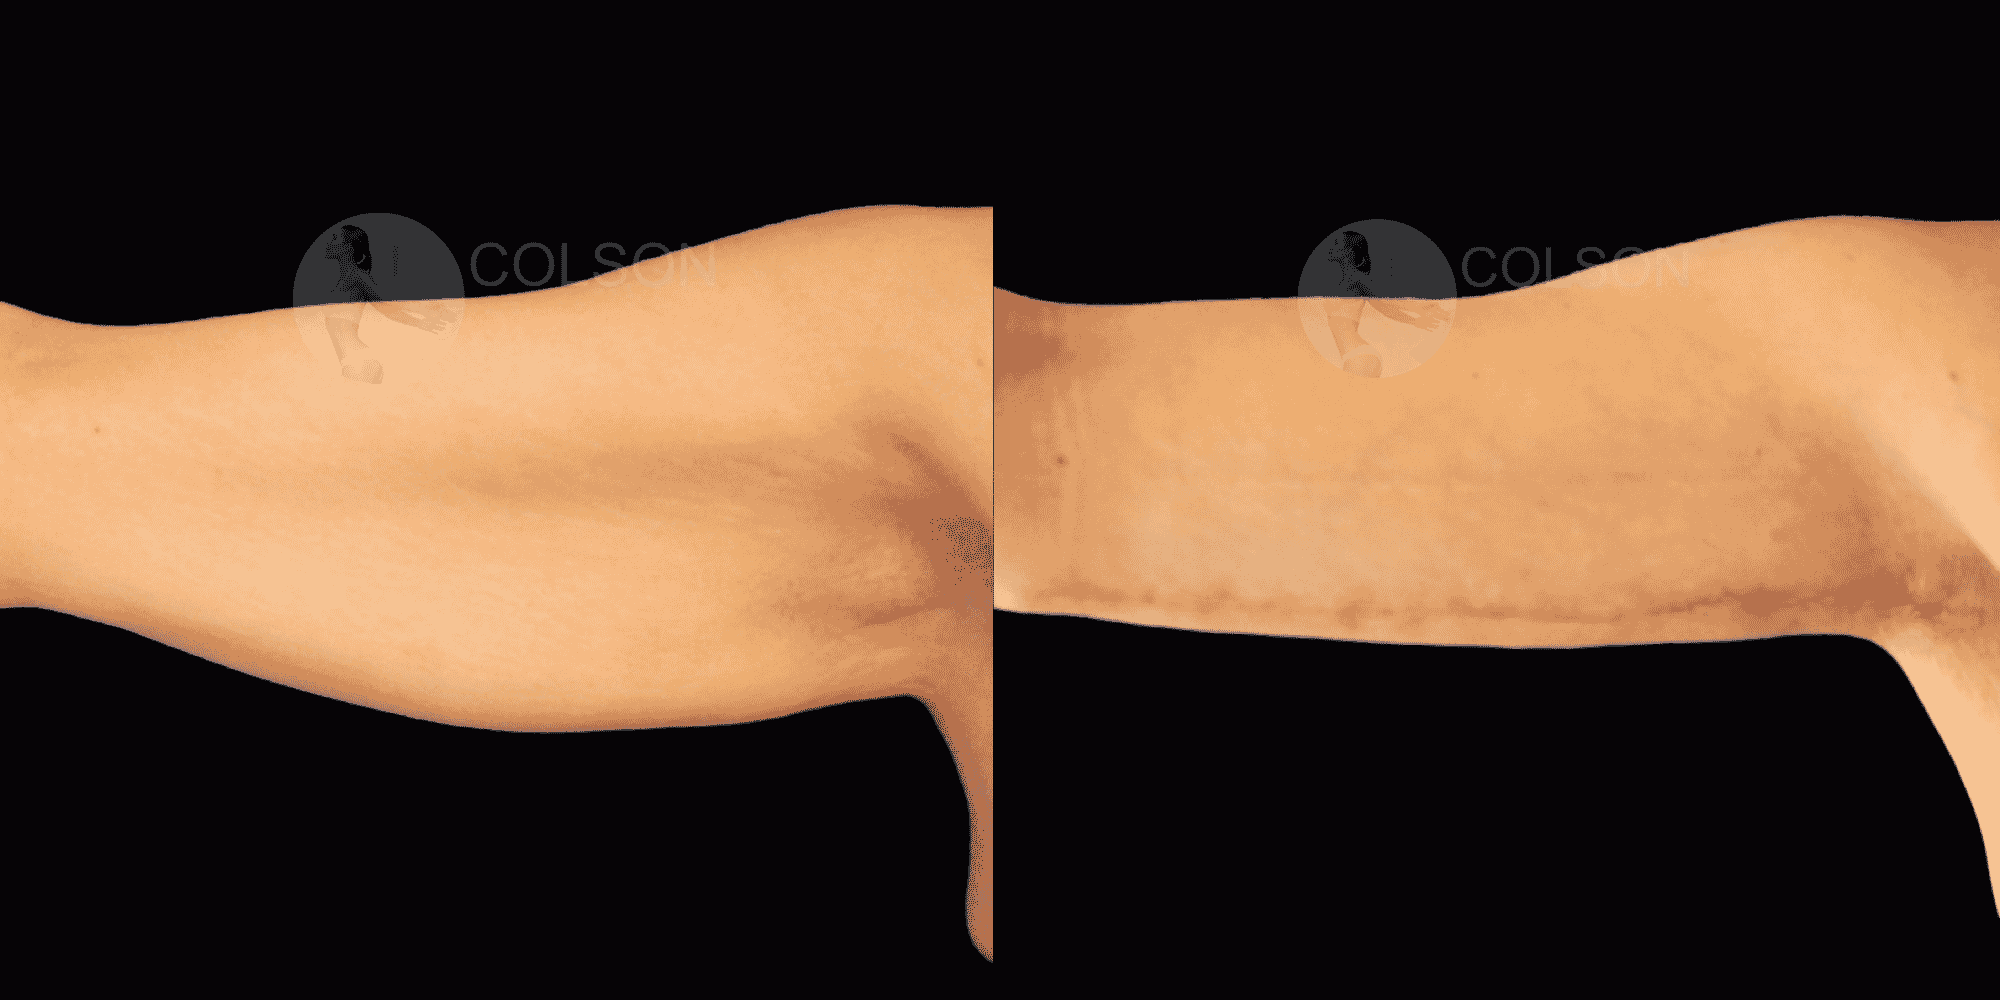 Dr Colson - Chirurgie silhouette - Lifting Bras Vue de Face